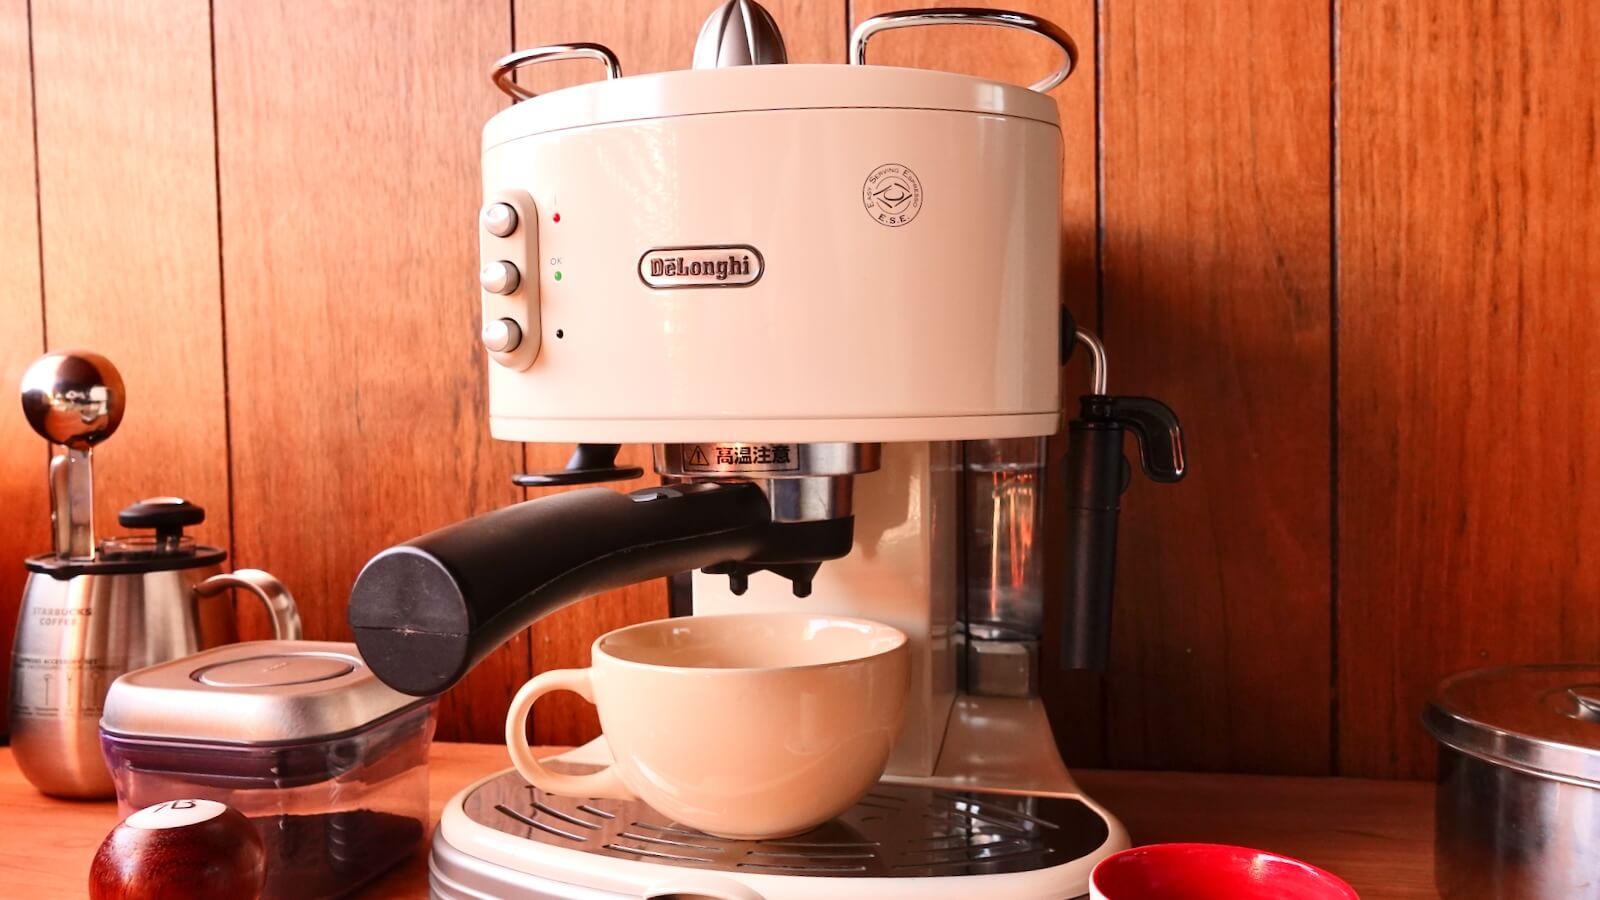 Delonghi espresso machine ECM300J Photo with a water bath saucer set